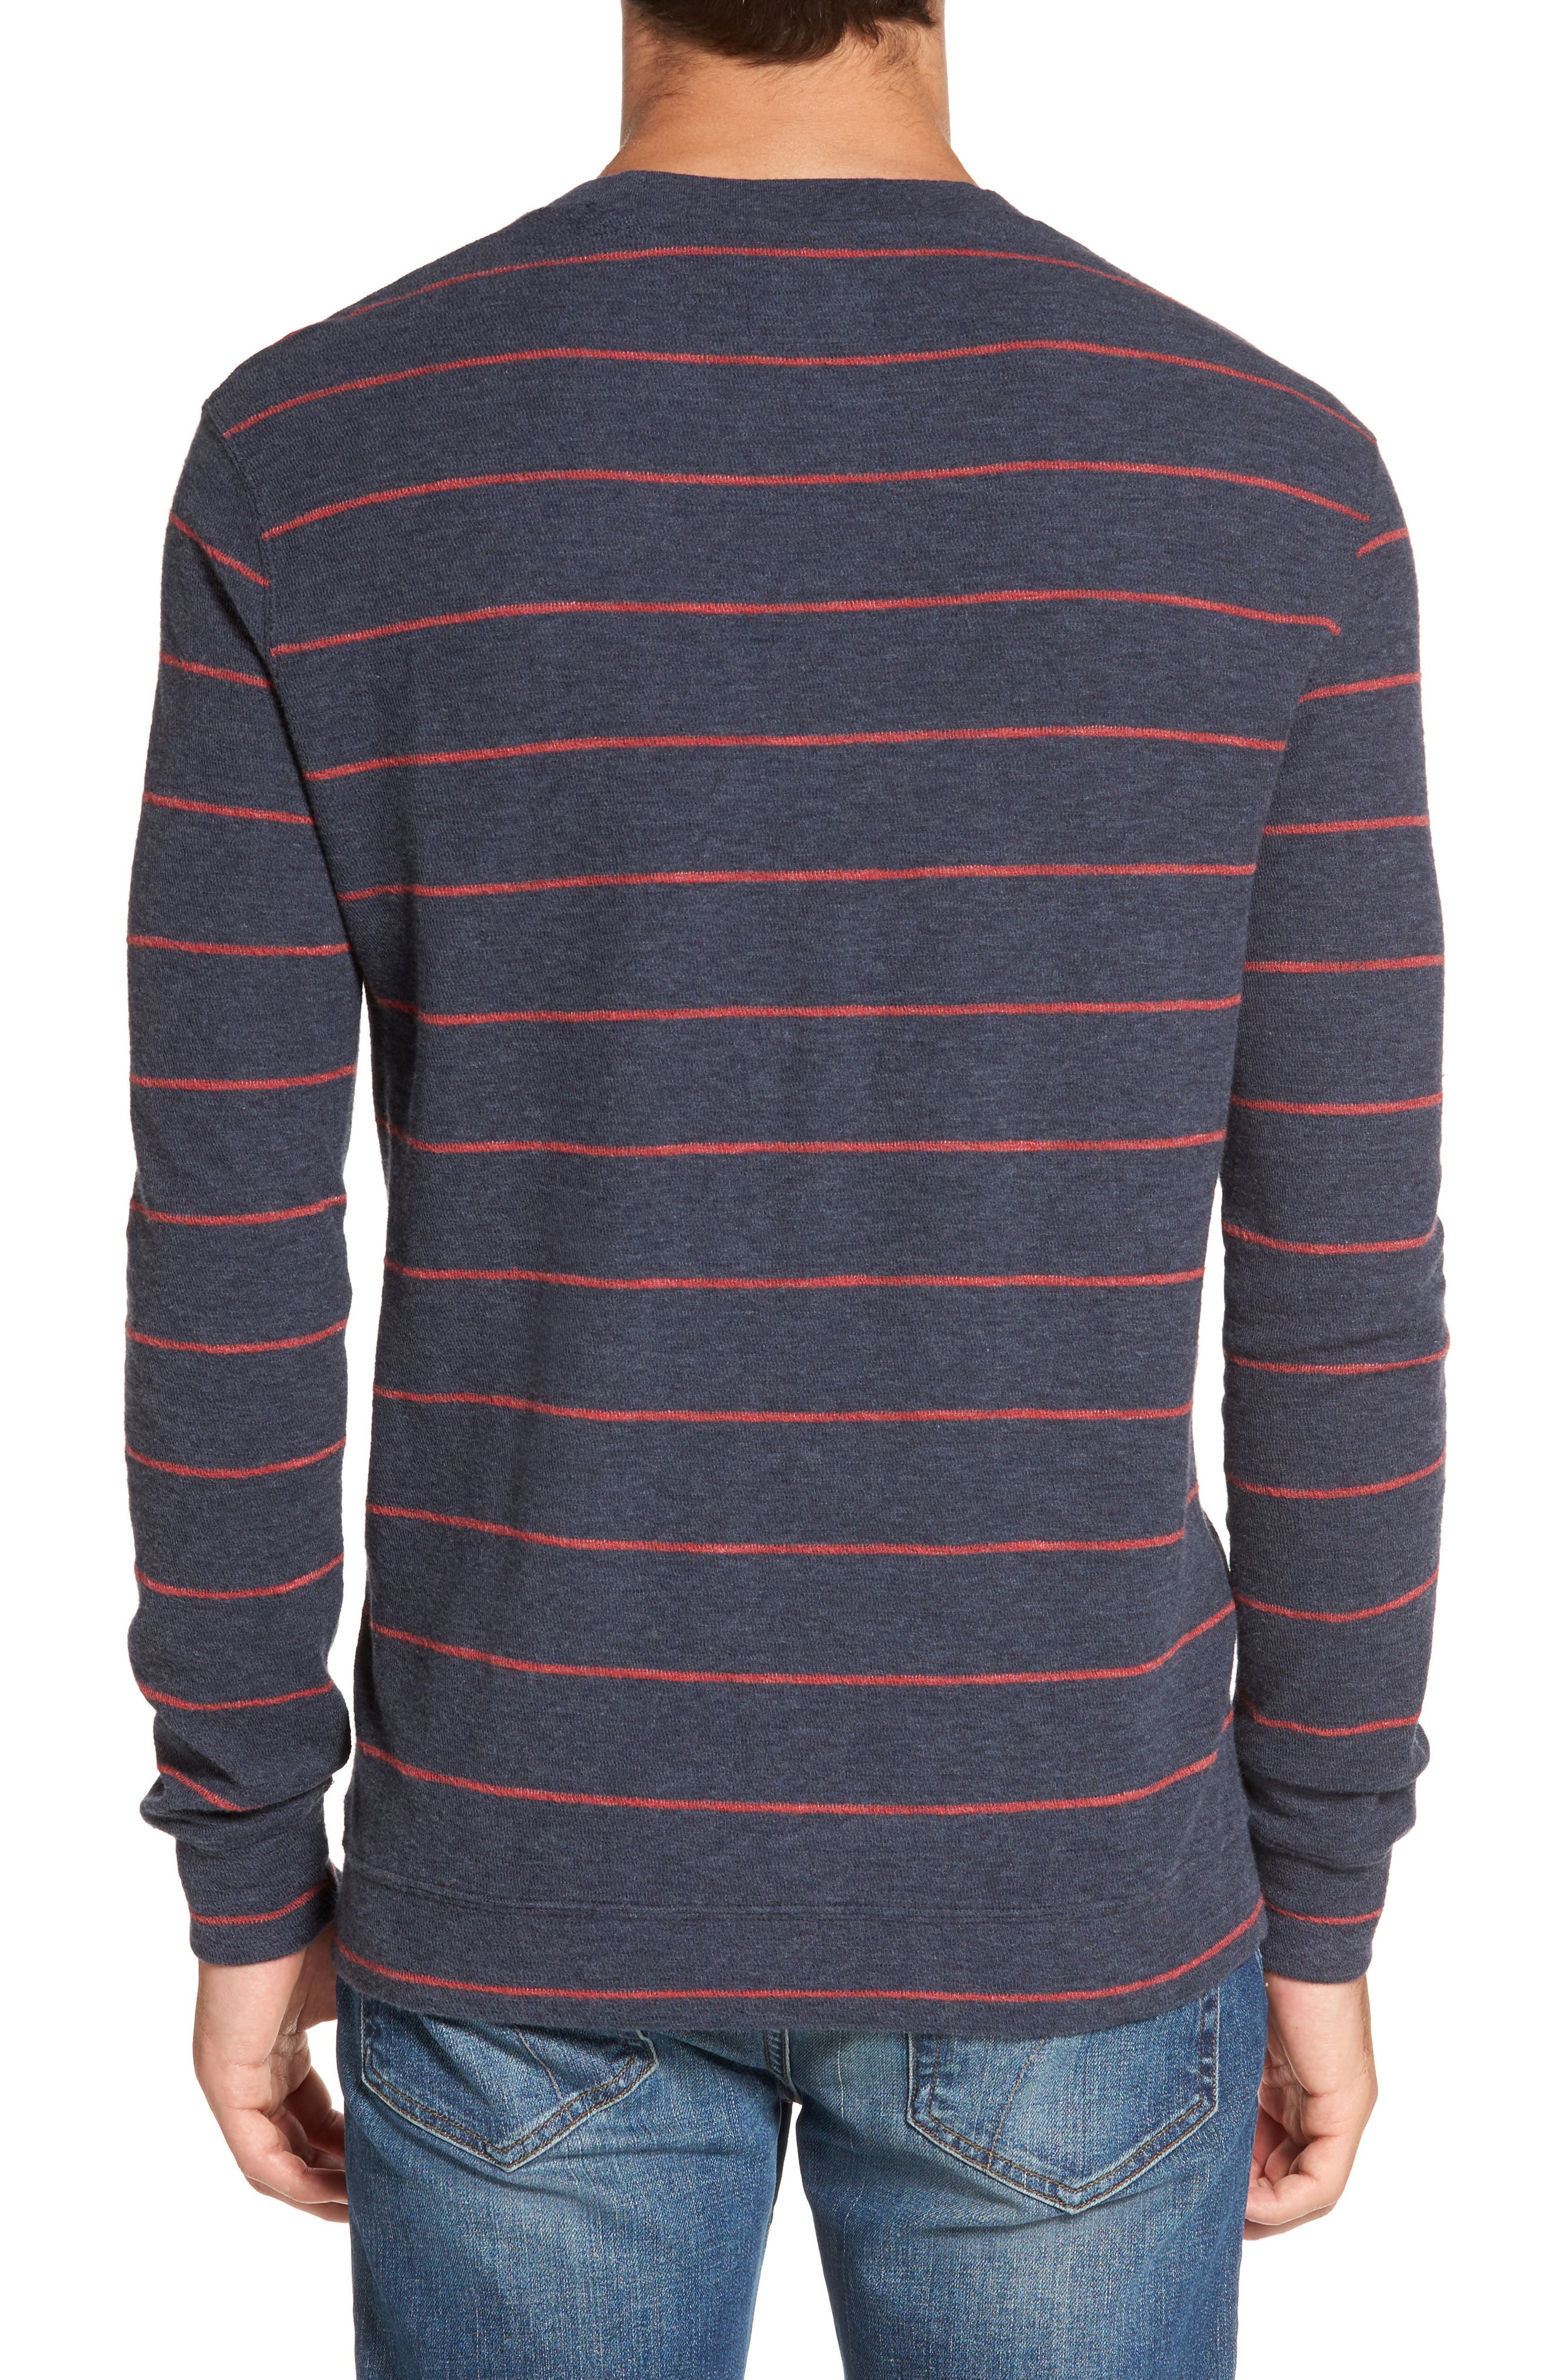 Baird Stripe Crewneck Sweatshirt,                             Alternate thumbnail 2, color,                             412